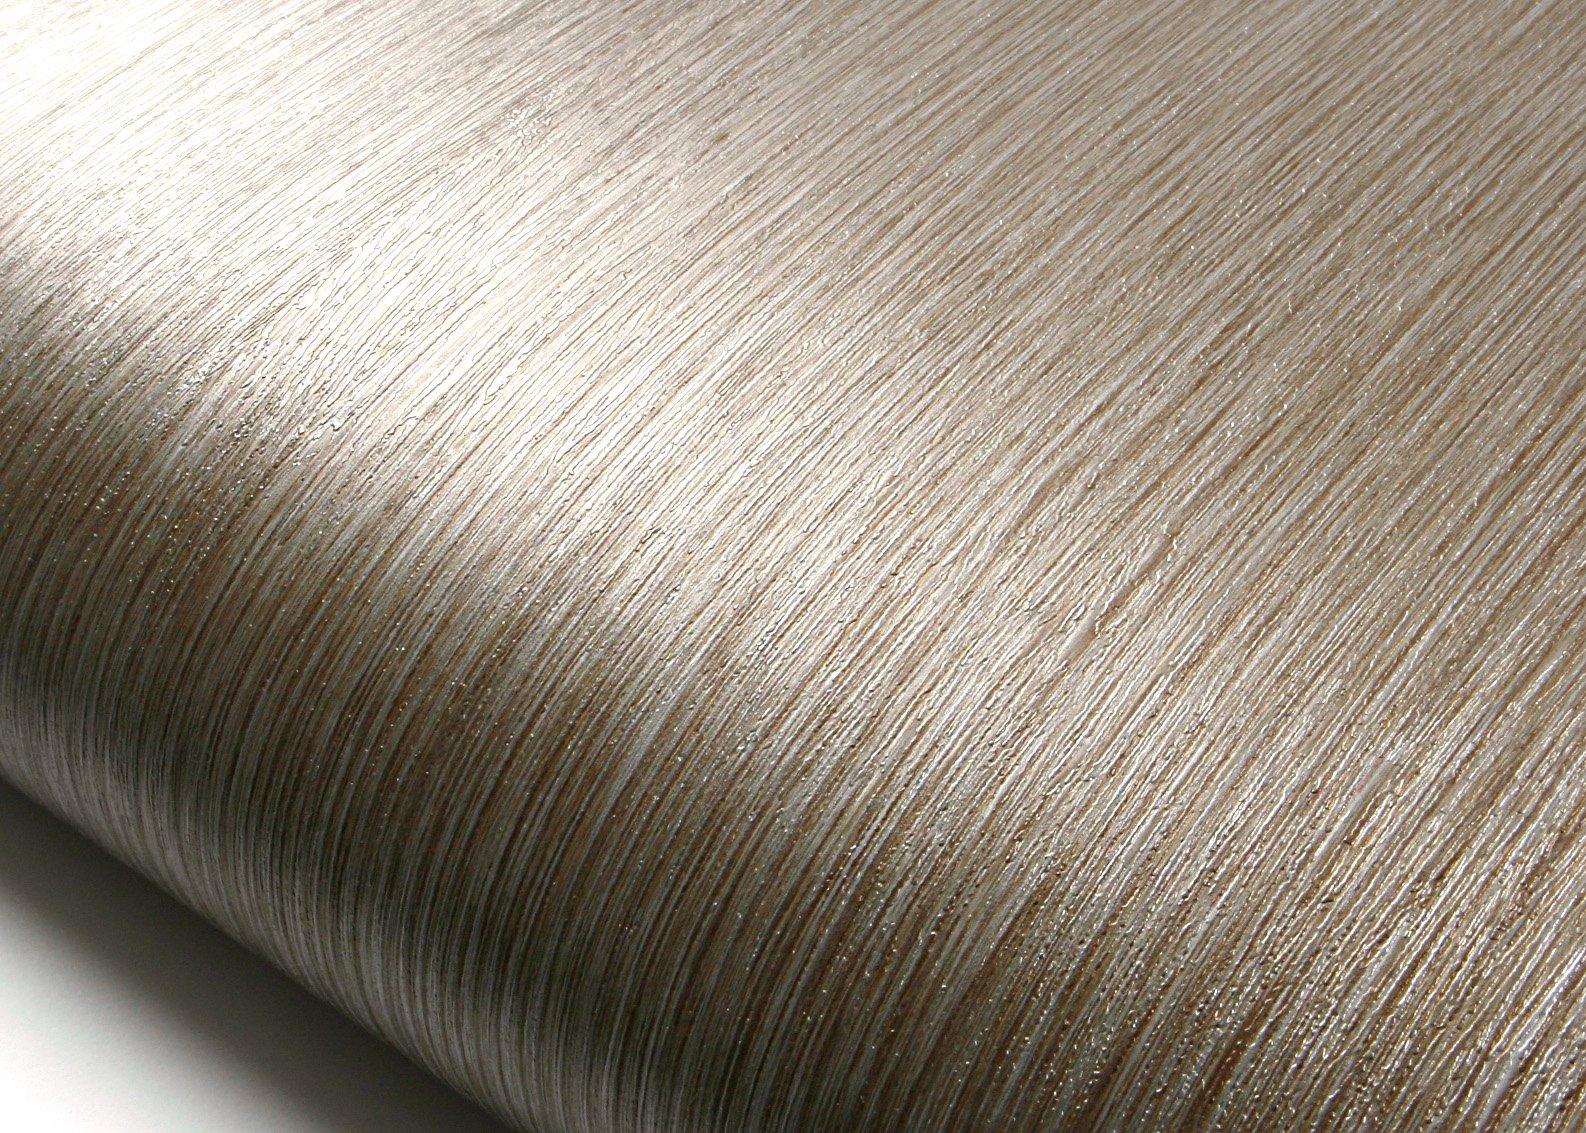 ROSEROSA Peel & Stick Backsplash Luxury Embossed Wood Contact Paper Self-adhesive Wallpaper Shelf Liner Table Door Reform (MG242 : 2.00 Feet X 6.56 Feet) by ROSEROSA (Image #1)